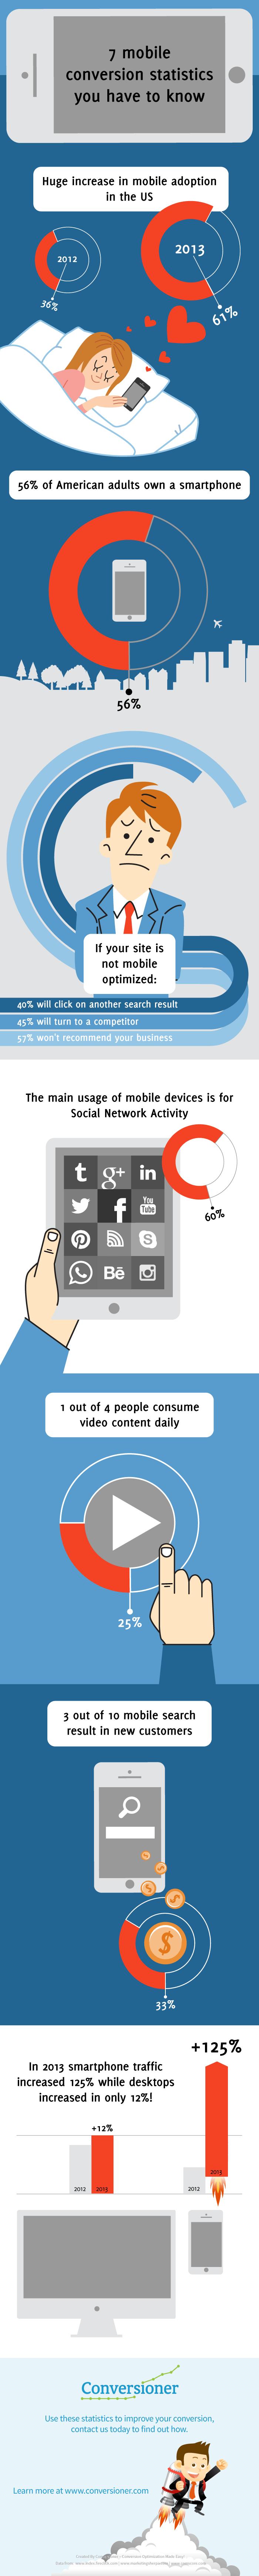 mobile statistics infographic